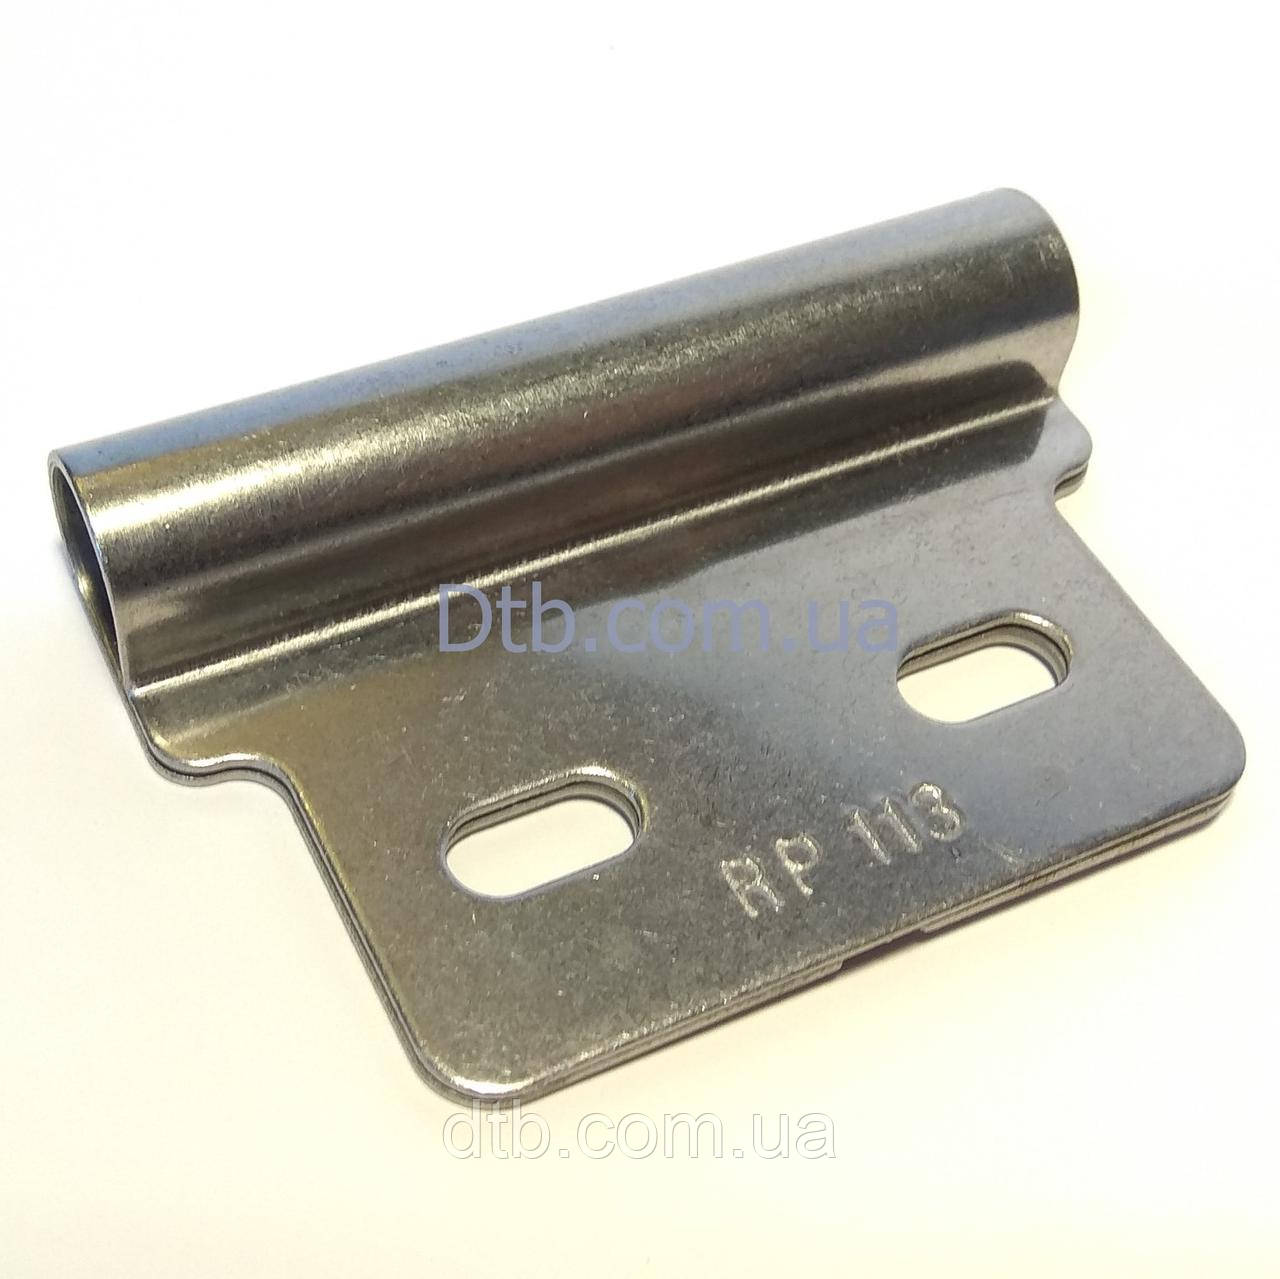 Накладка роликовий нержавіюча RP113 - роликодержатель Alutech